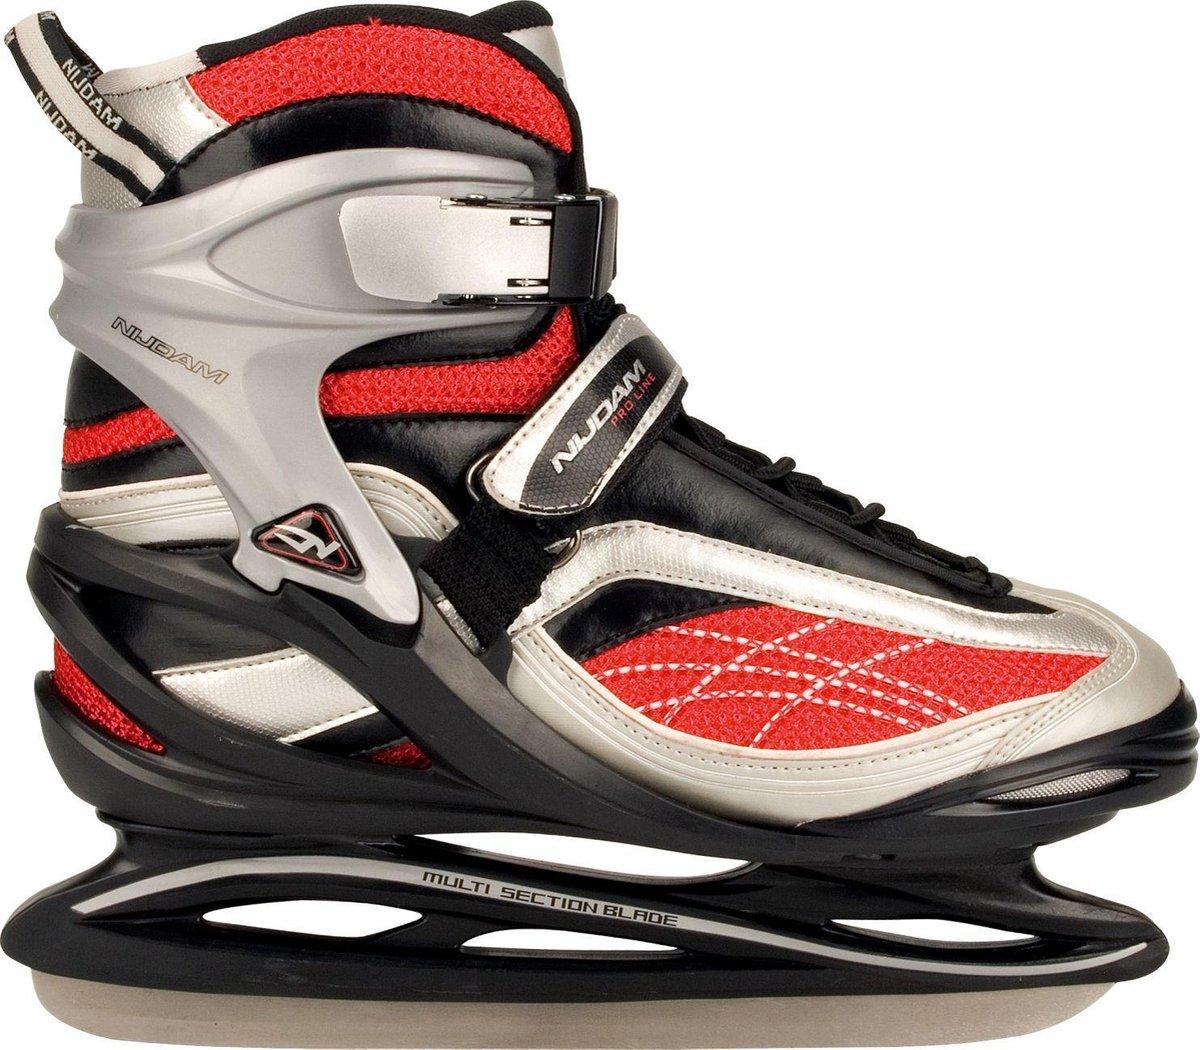 Nijdam IJshockeyschaats Pro-Line - Semi-Softboot - Zwart/Zilver/Rood - 39